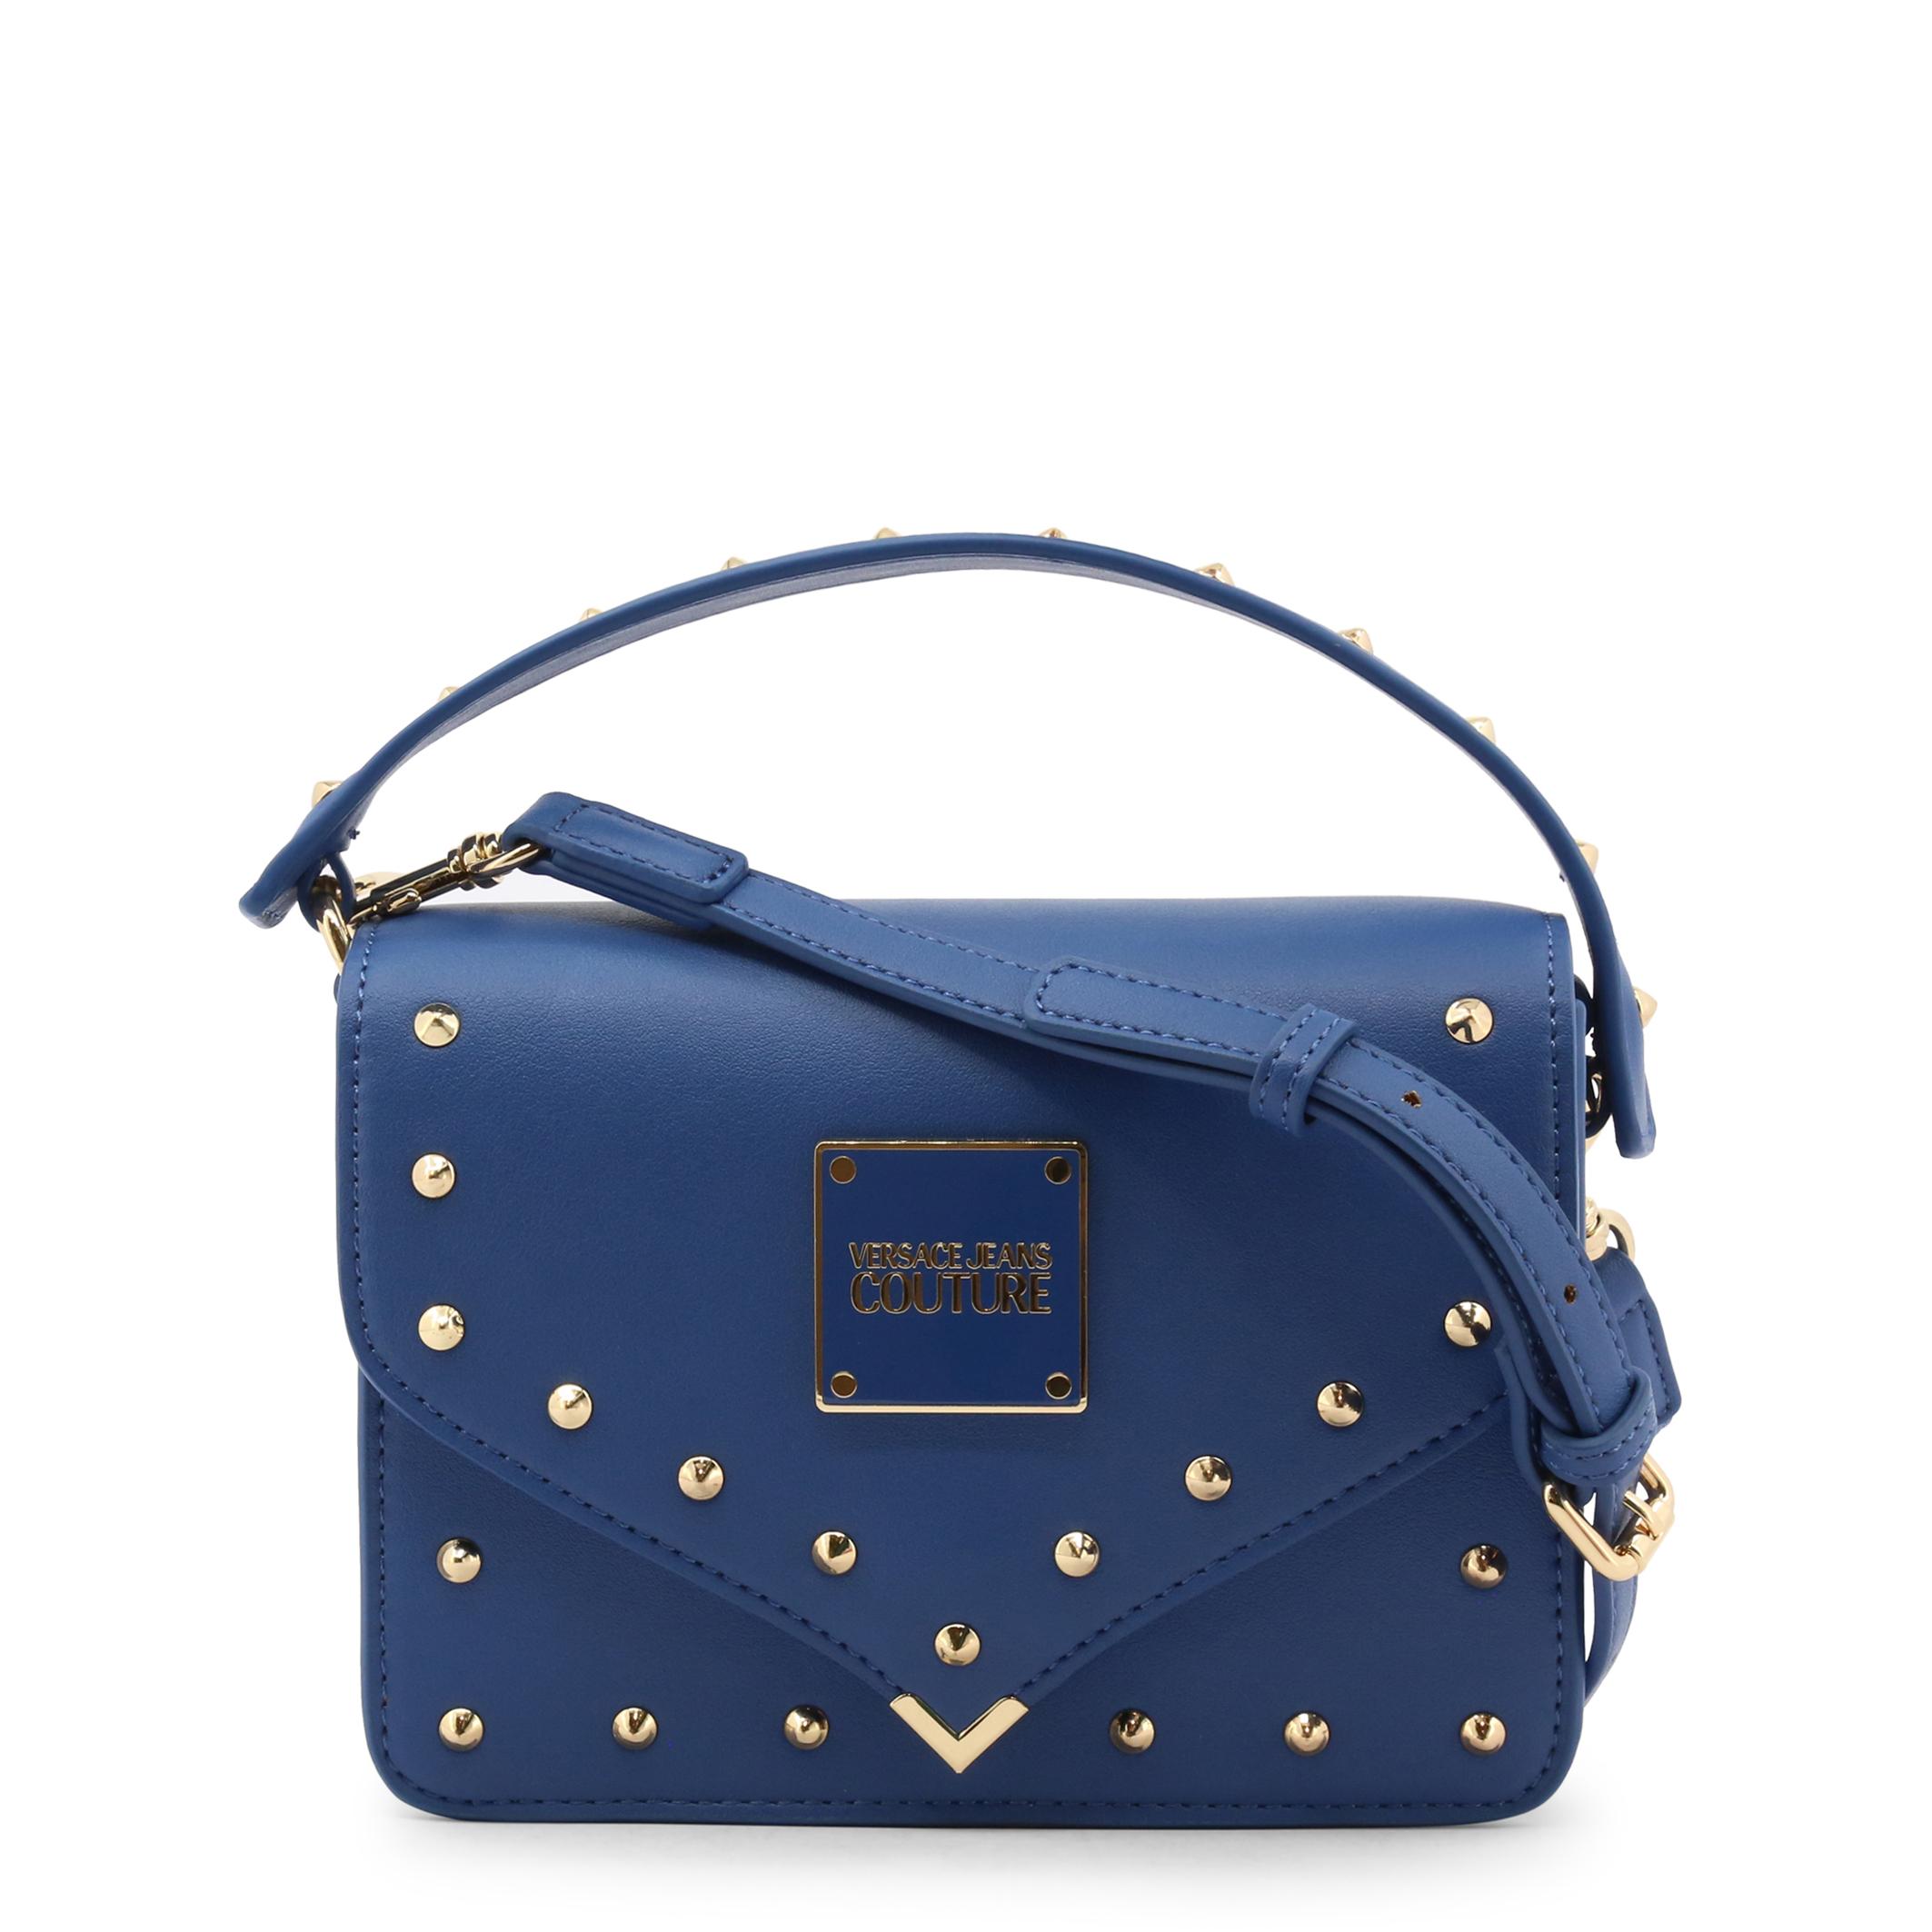 Versace Jeans – 71VA4BE1_71407 – Blauw Designeritems.nl